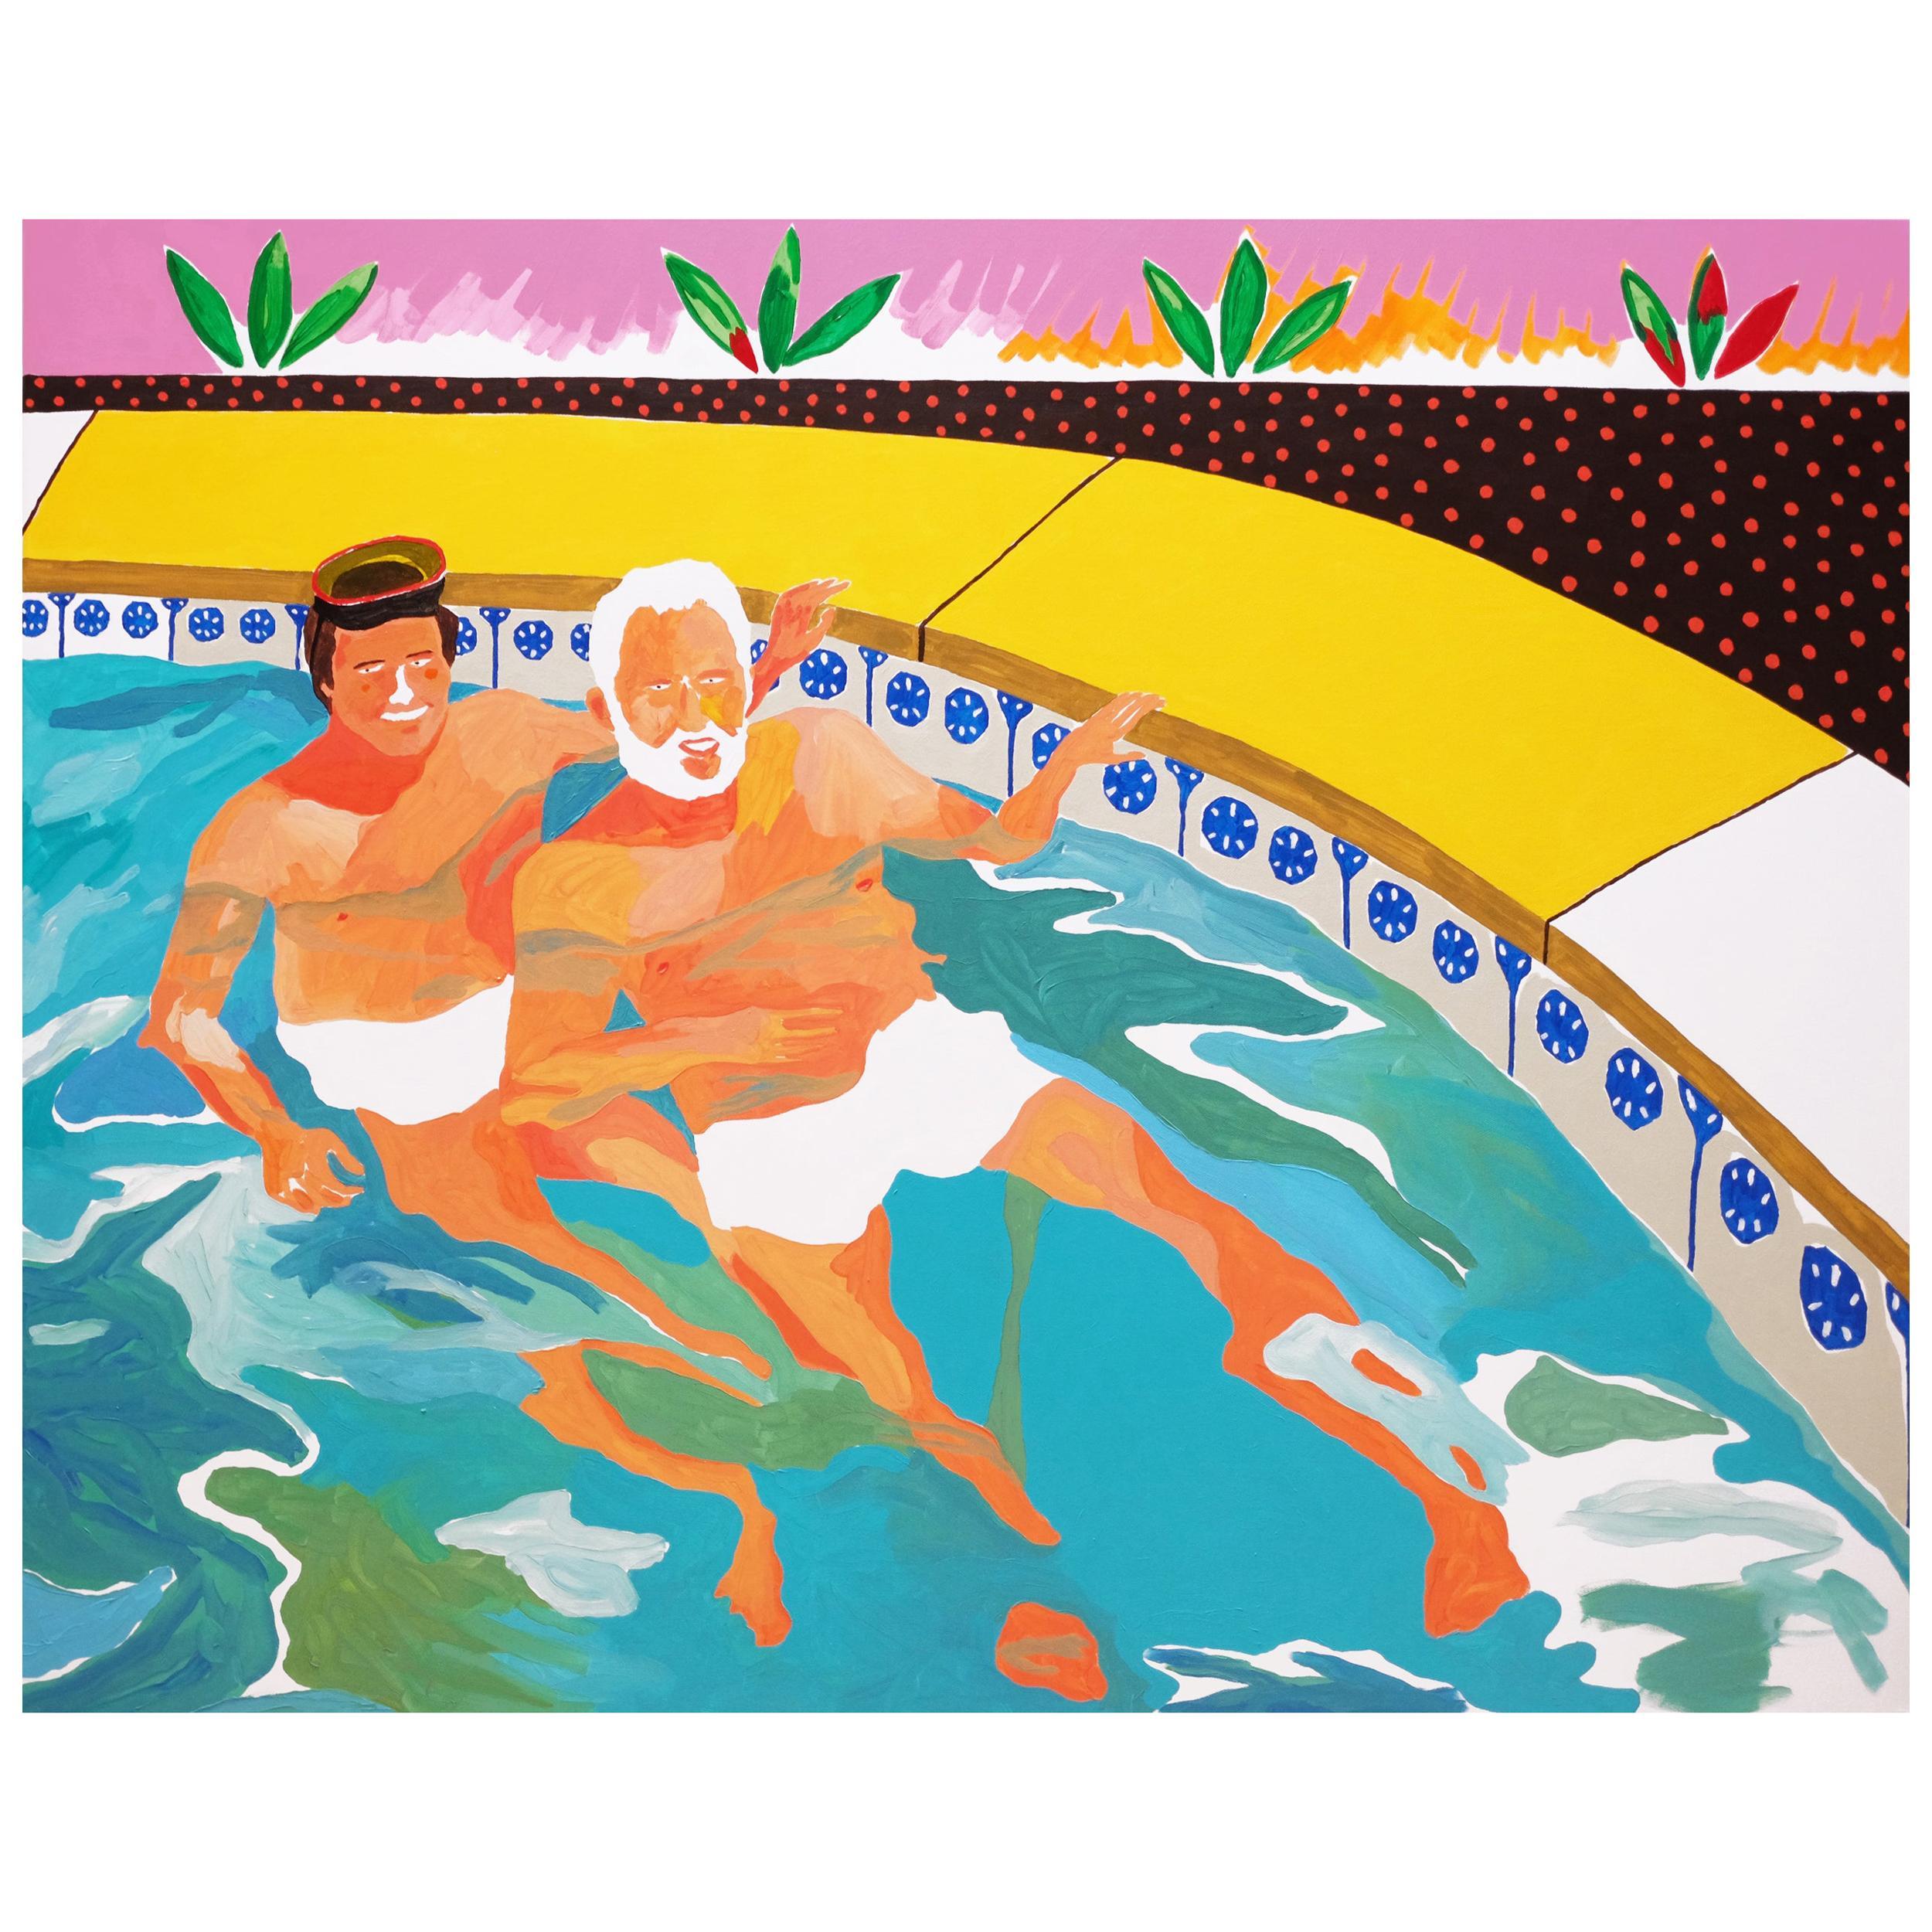 'When Good Neighbours Become Good Friends' Painting by Alan Fears Pop Art